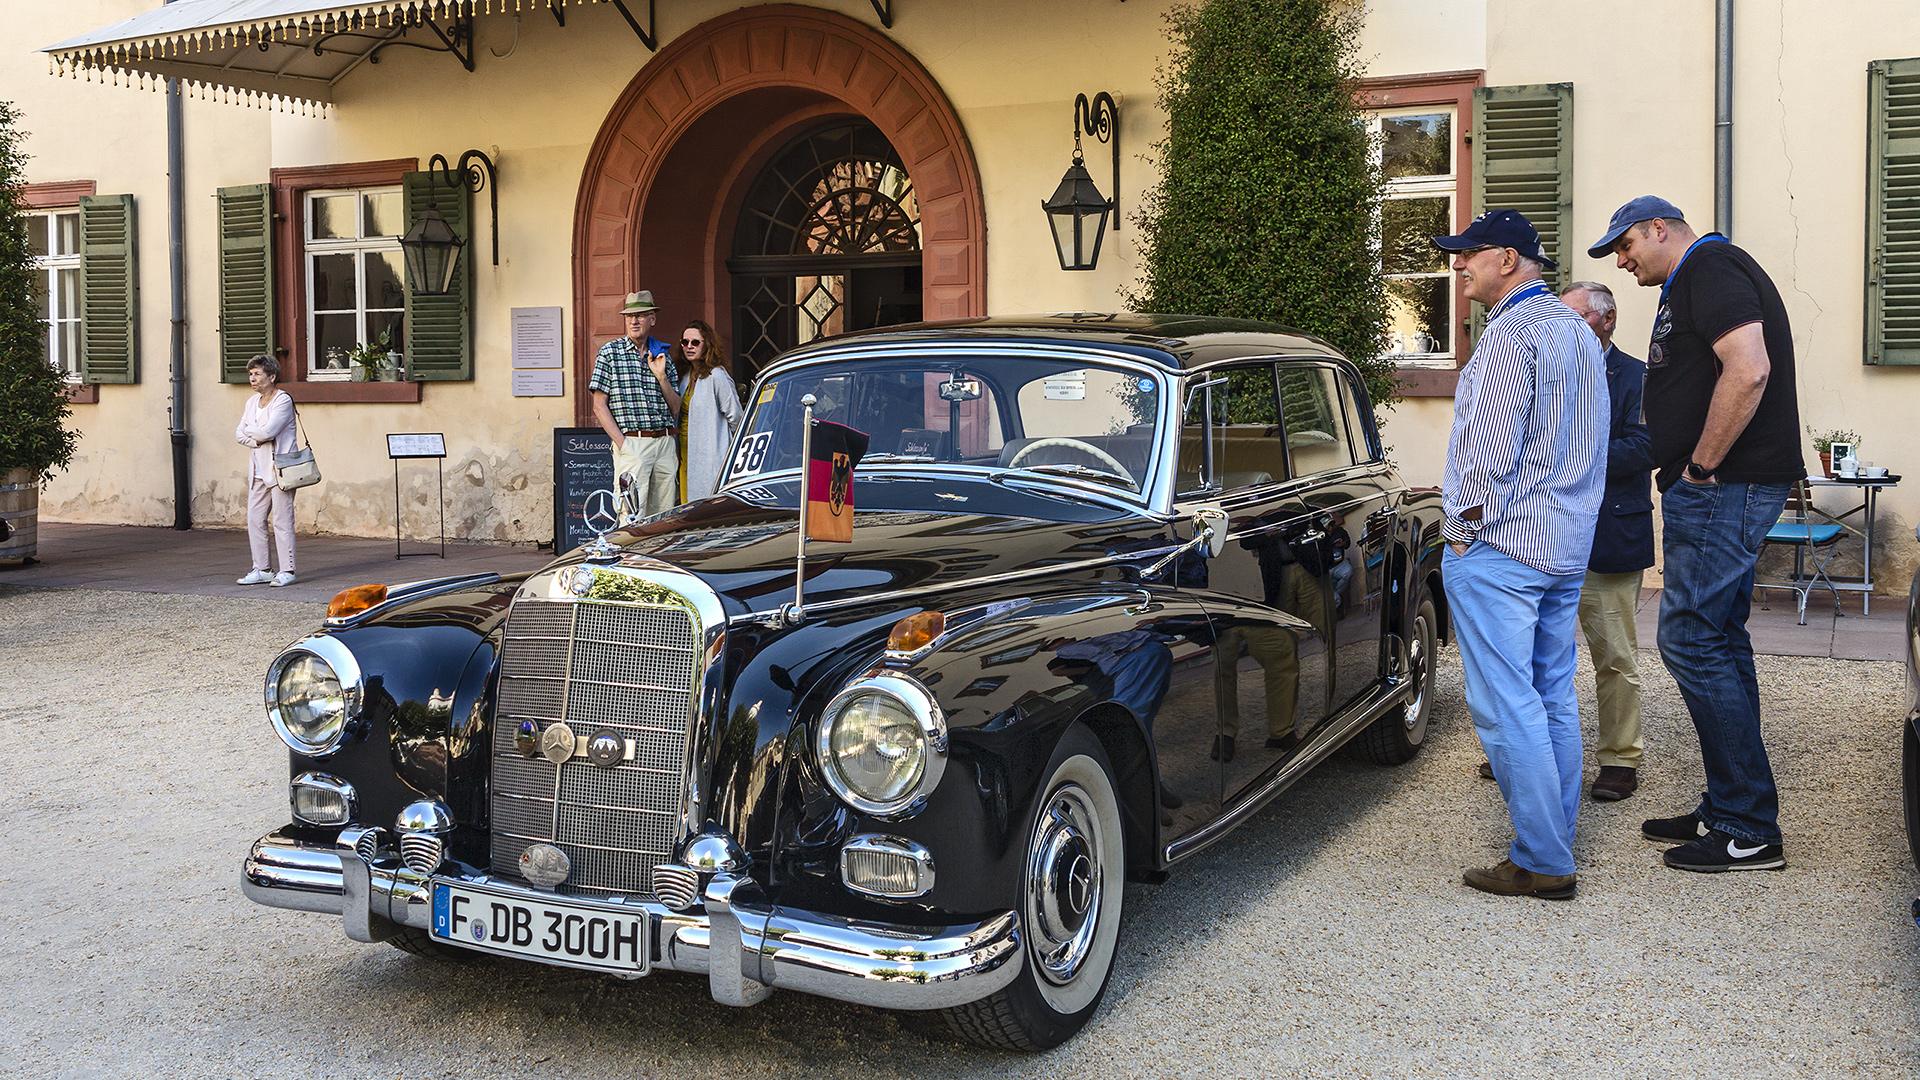 SCHWARZ-ROT-GOLD - DB 300H